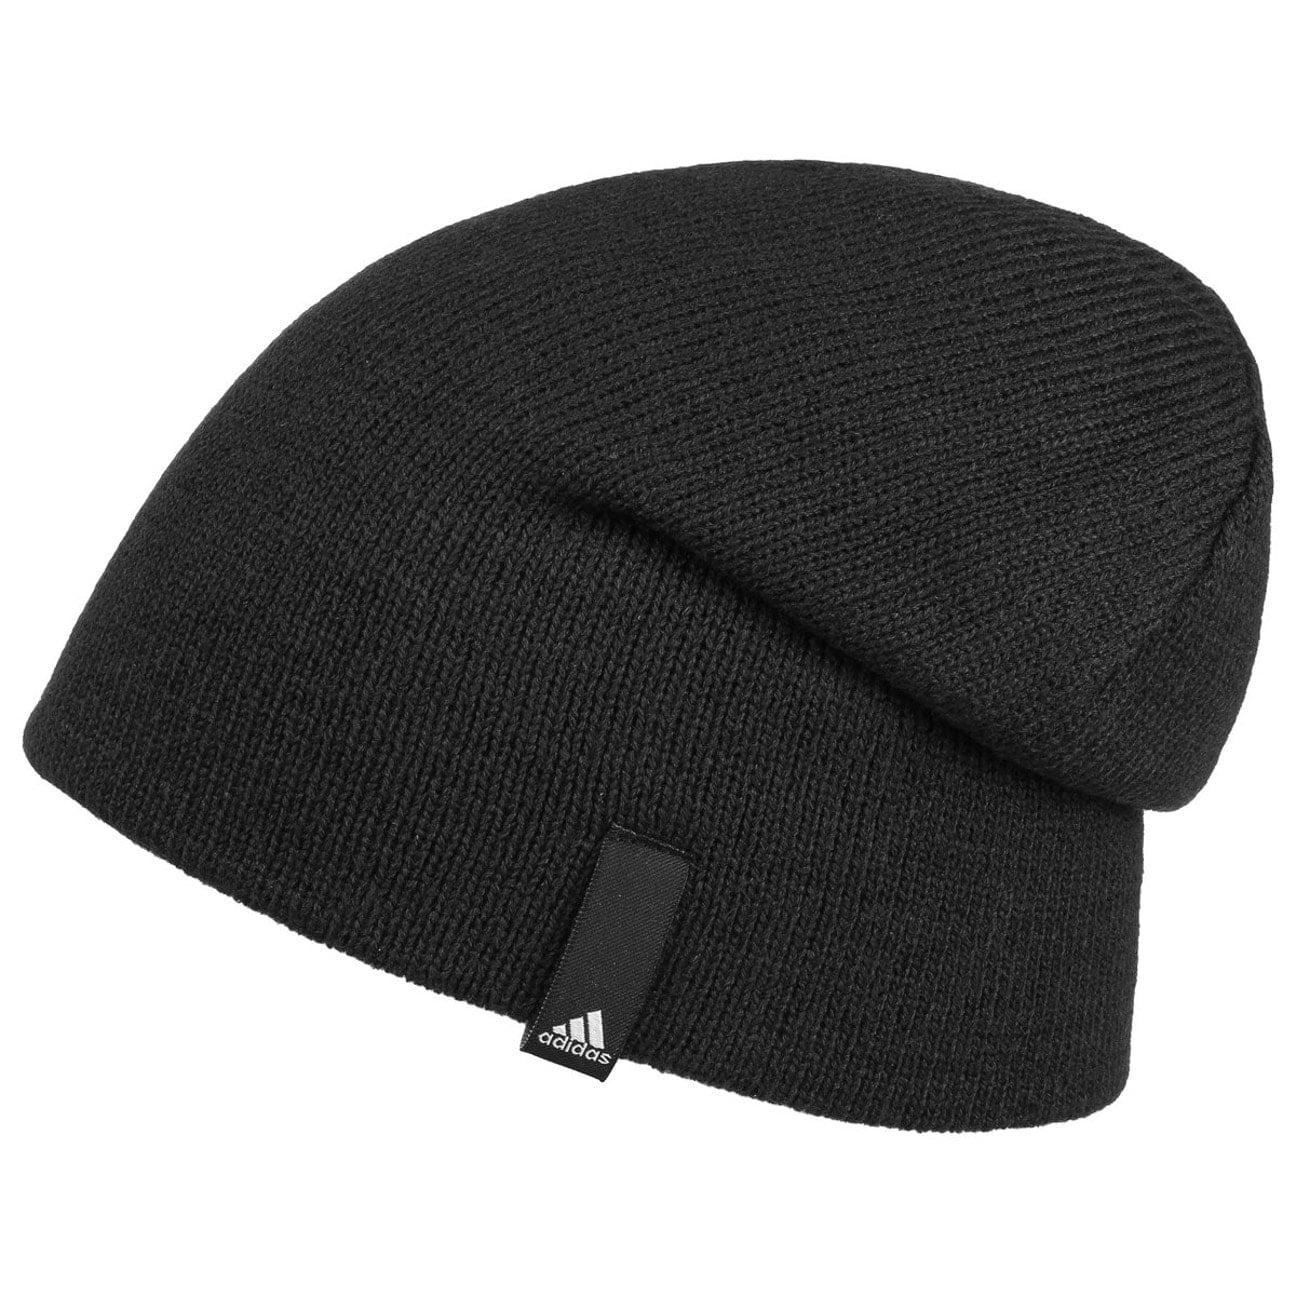 ... Perf Beanie by adidas - black 3 ... 8ee1eab0ed2